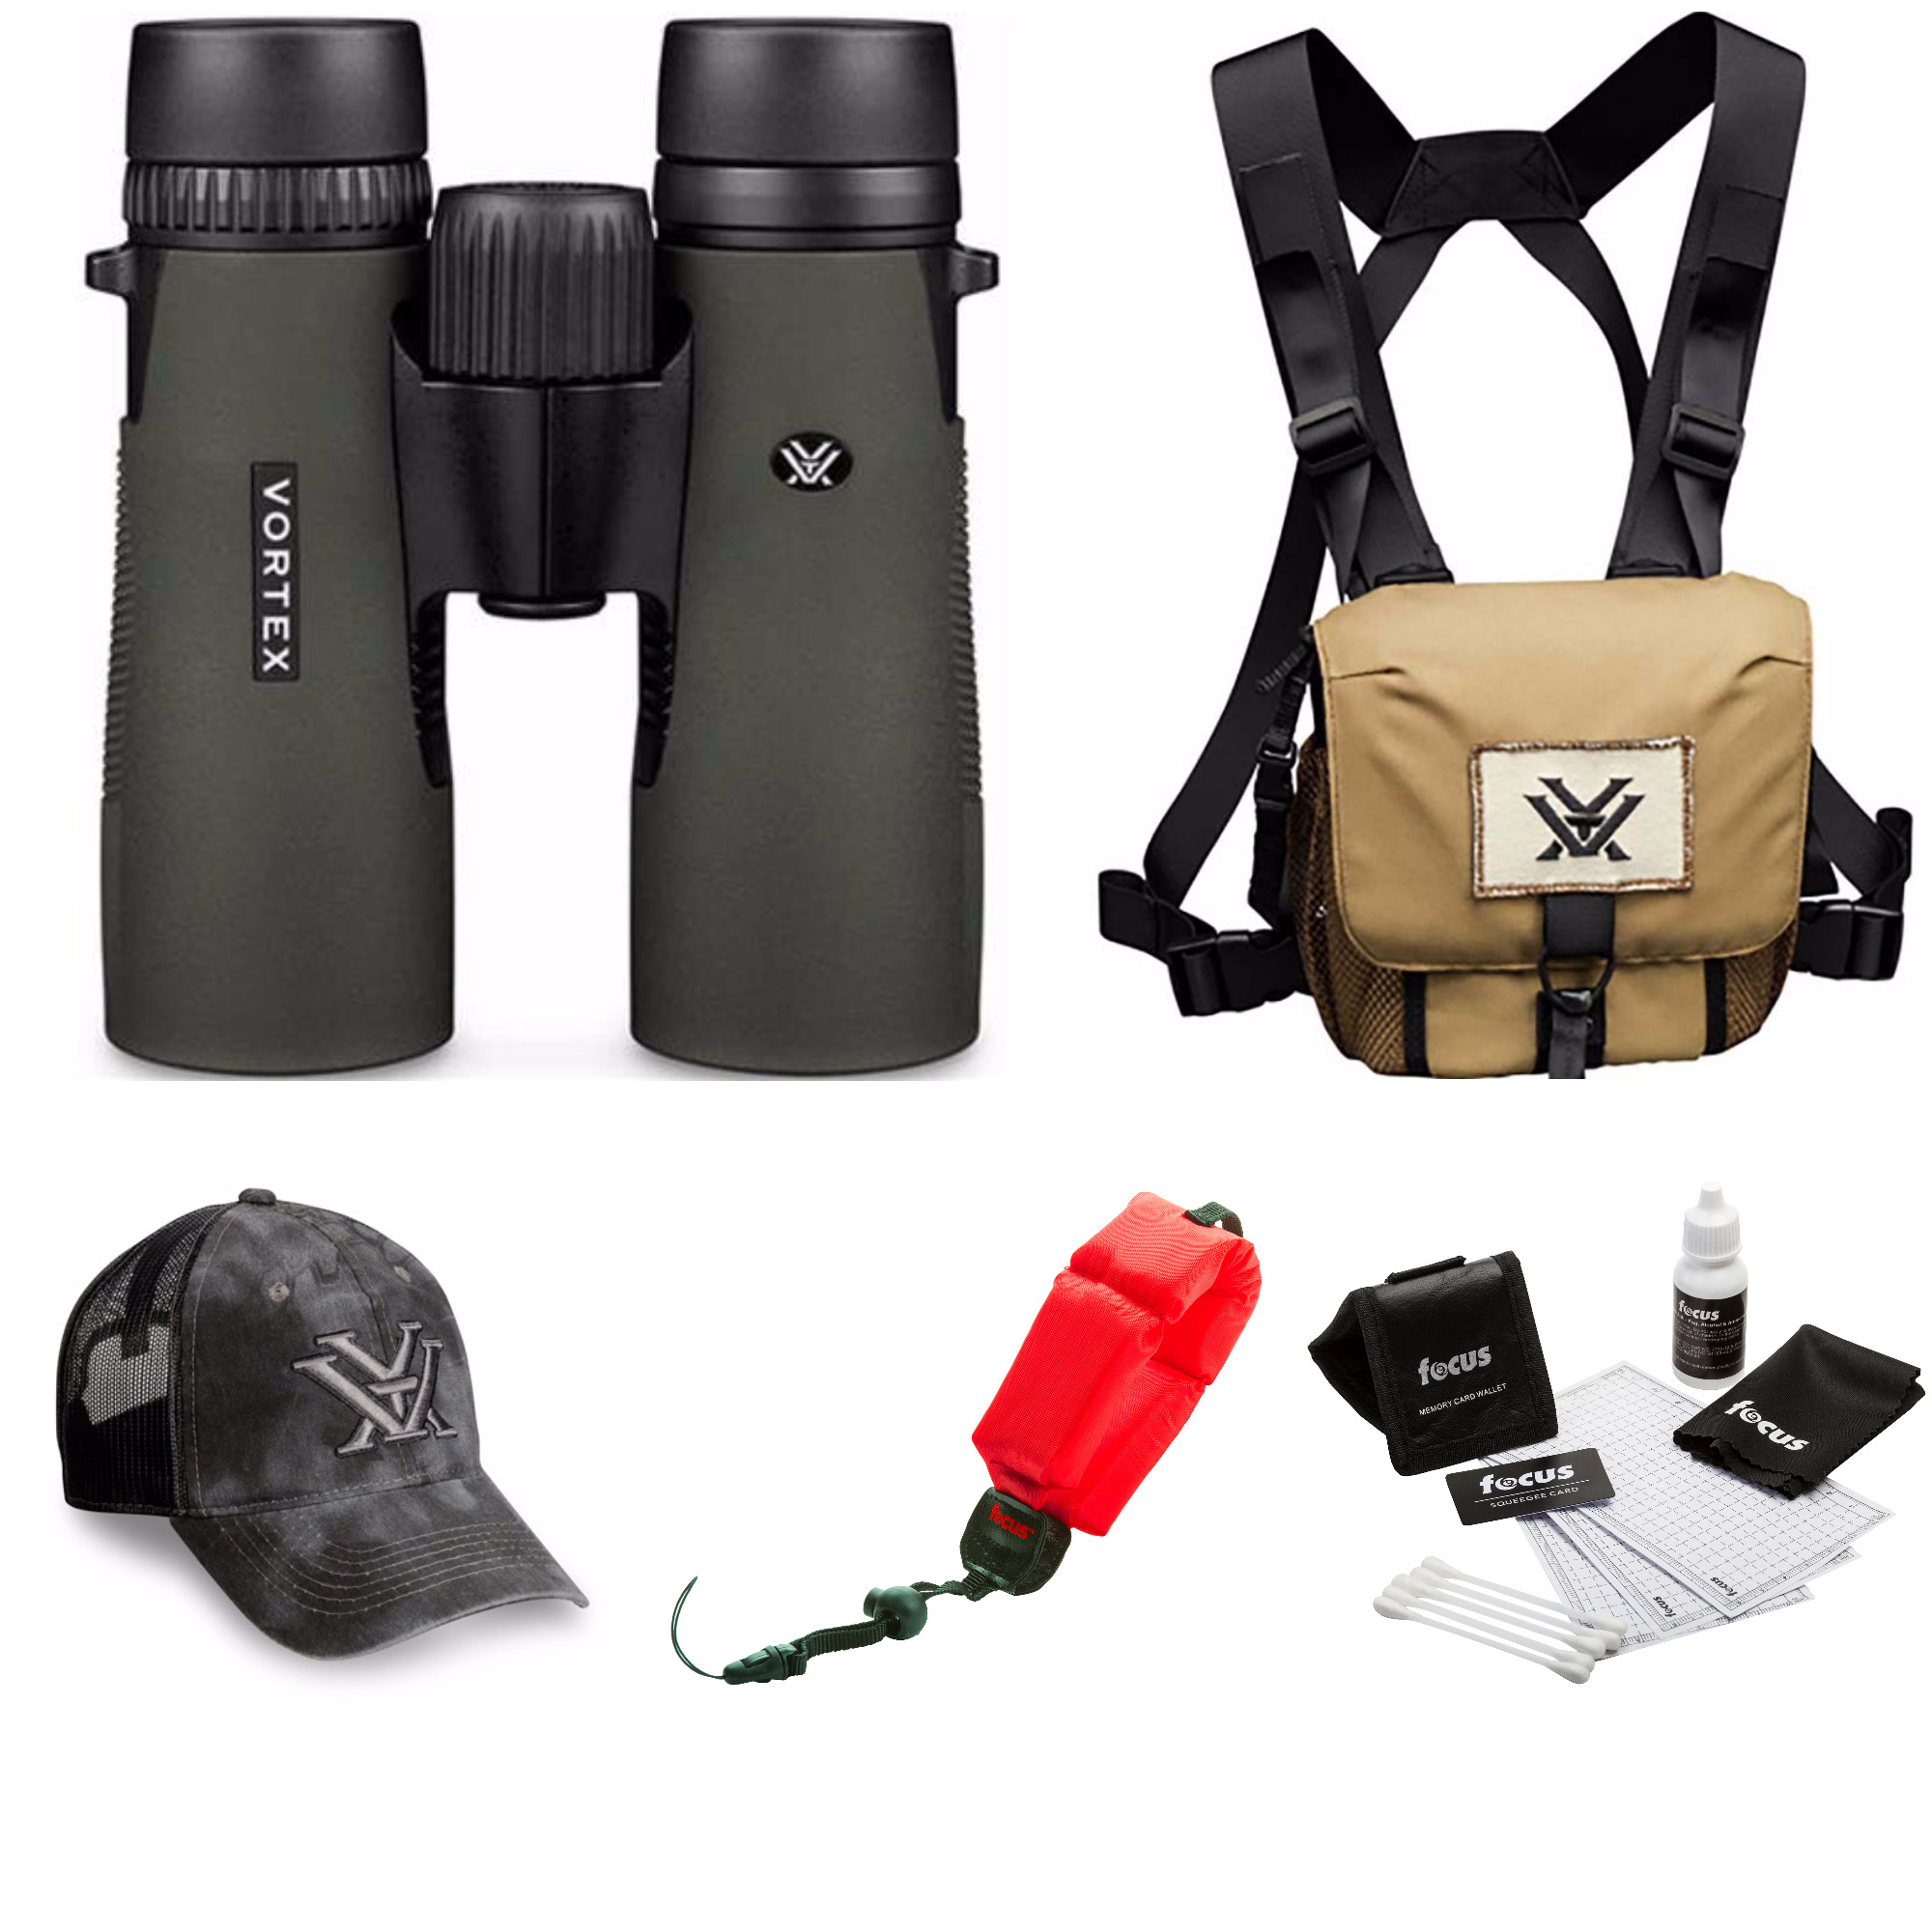 Vortex Diamondback 8x42mm Binoculars (Green)  + Glasspak Harness Bundle